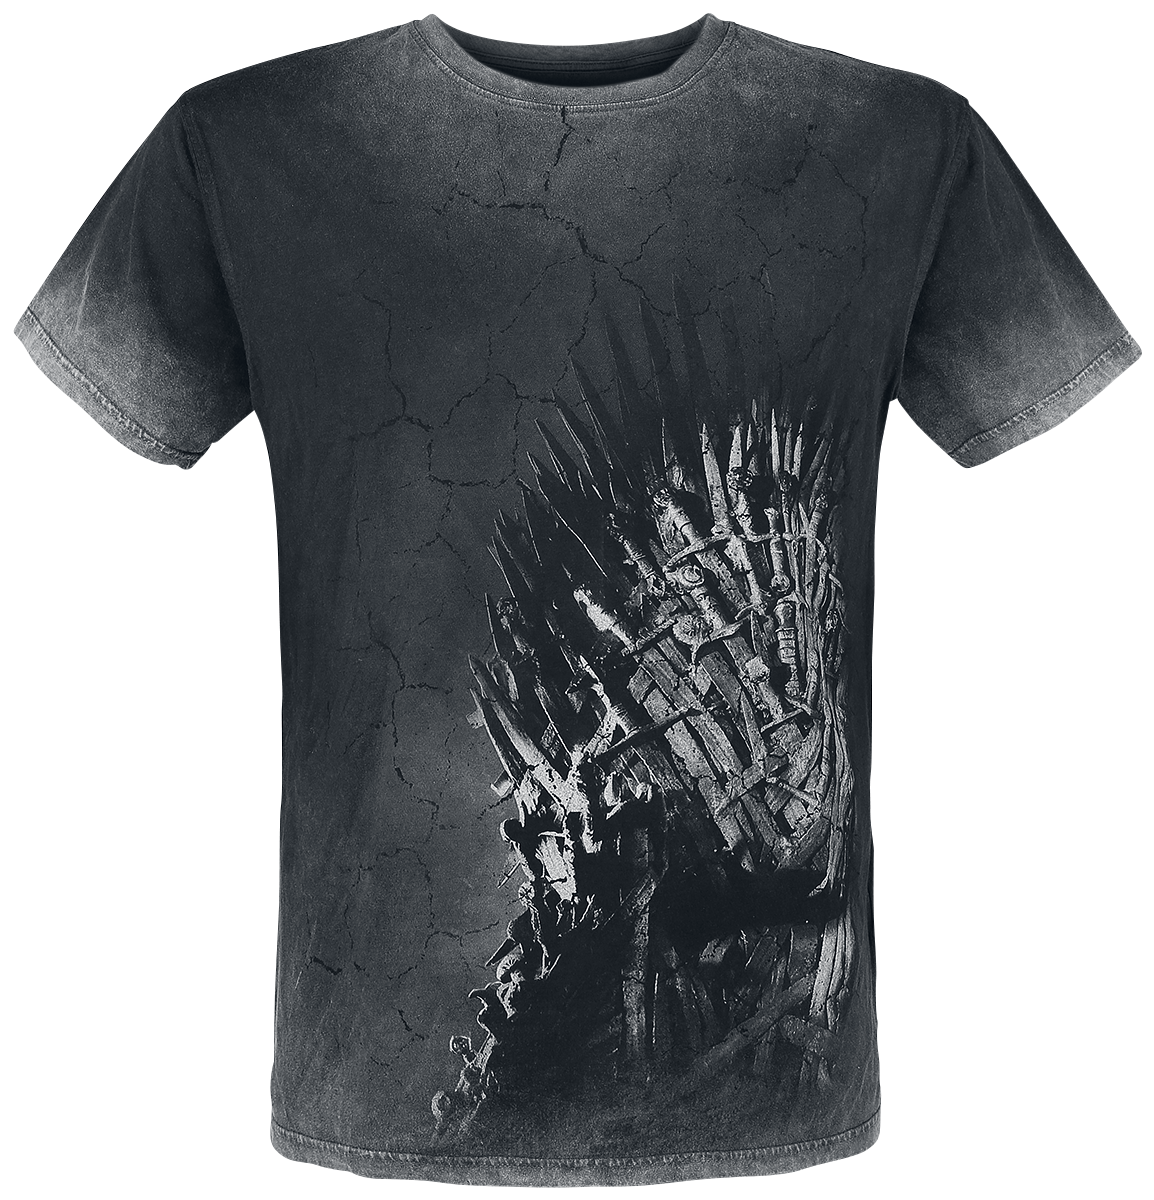 Game of Thrones - Iron Throne - T-Shirt - black-grey image